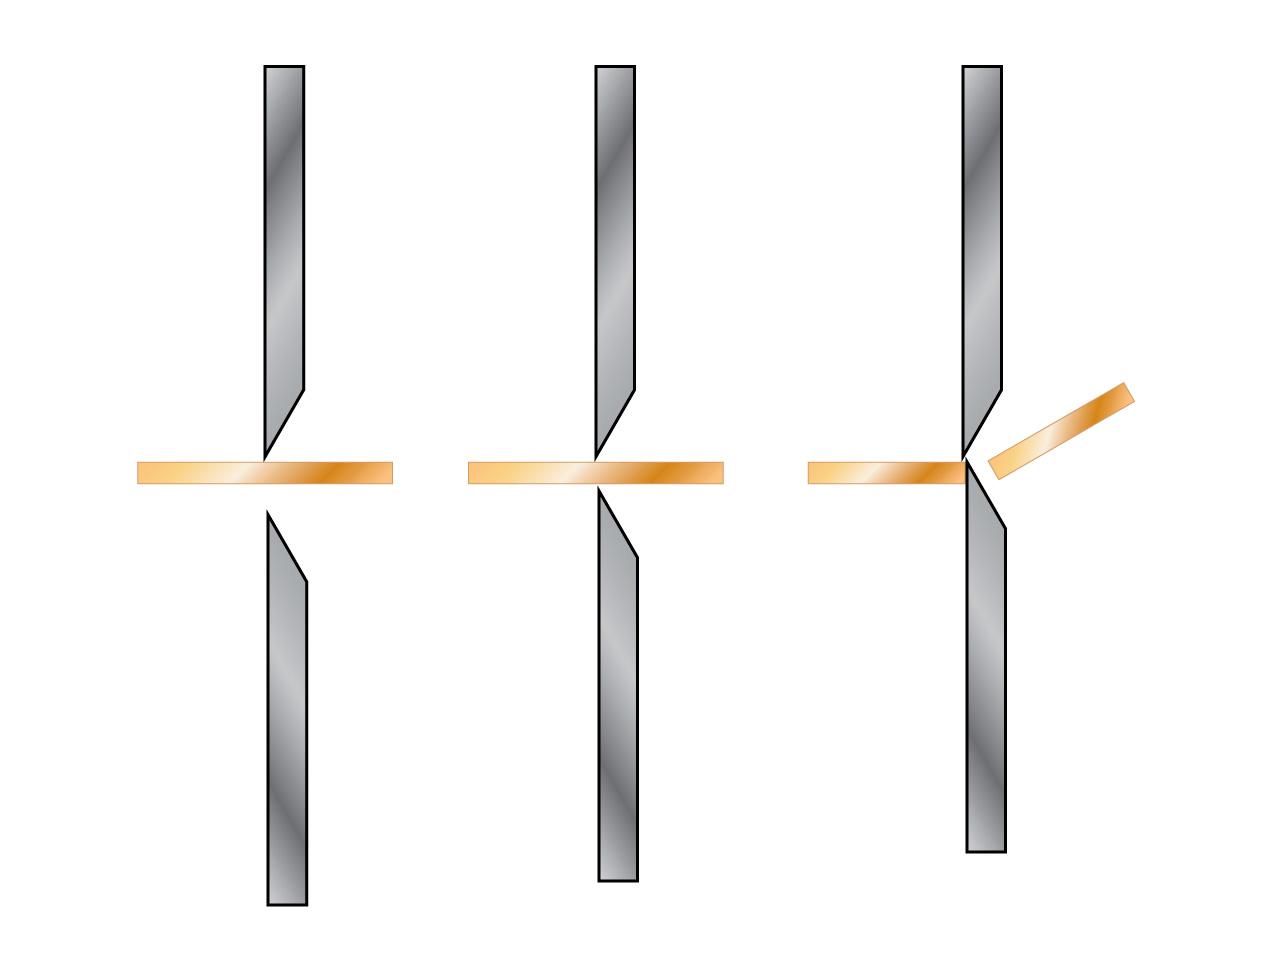 Xuron-Multi-Purpose-Pliers-Cutters-Shears-and-Scissors thumbnail 31